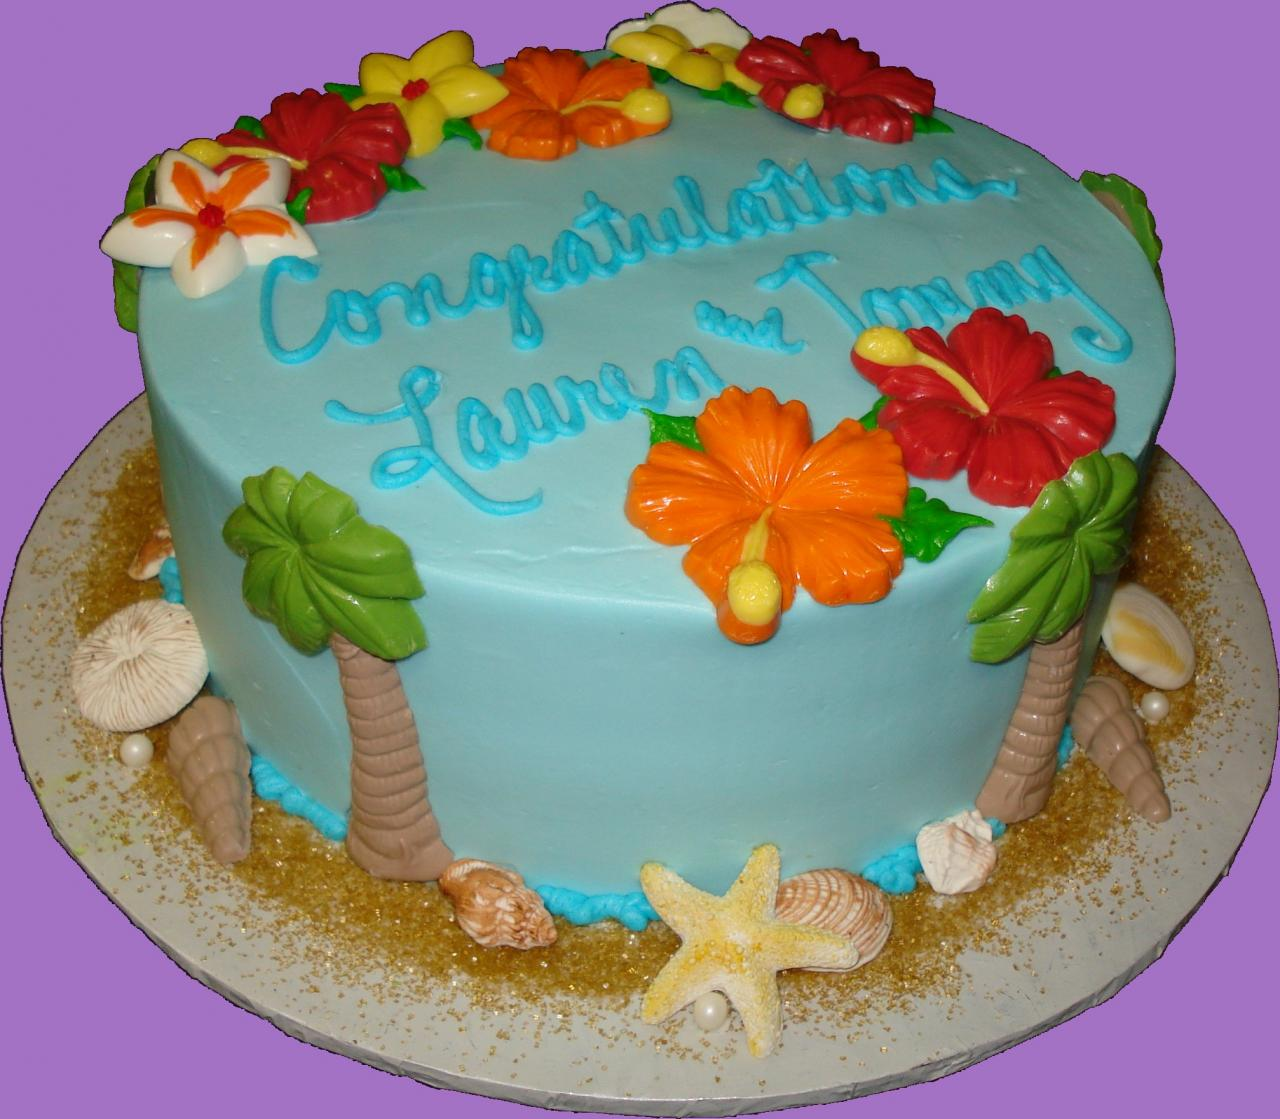 Decorations For Bridal Shower Cake